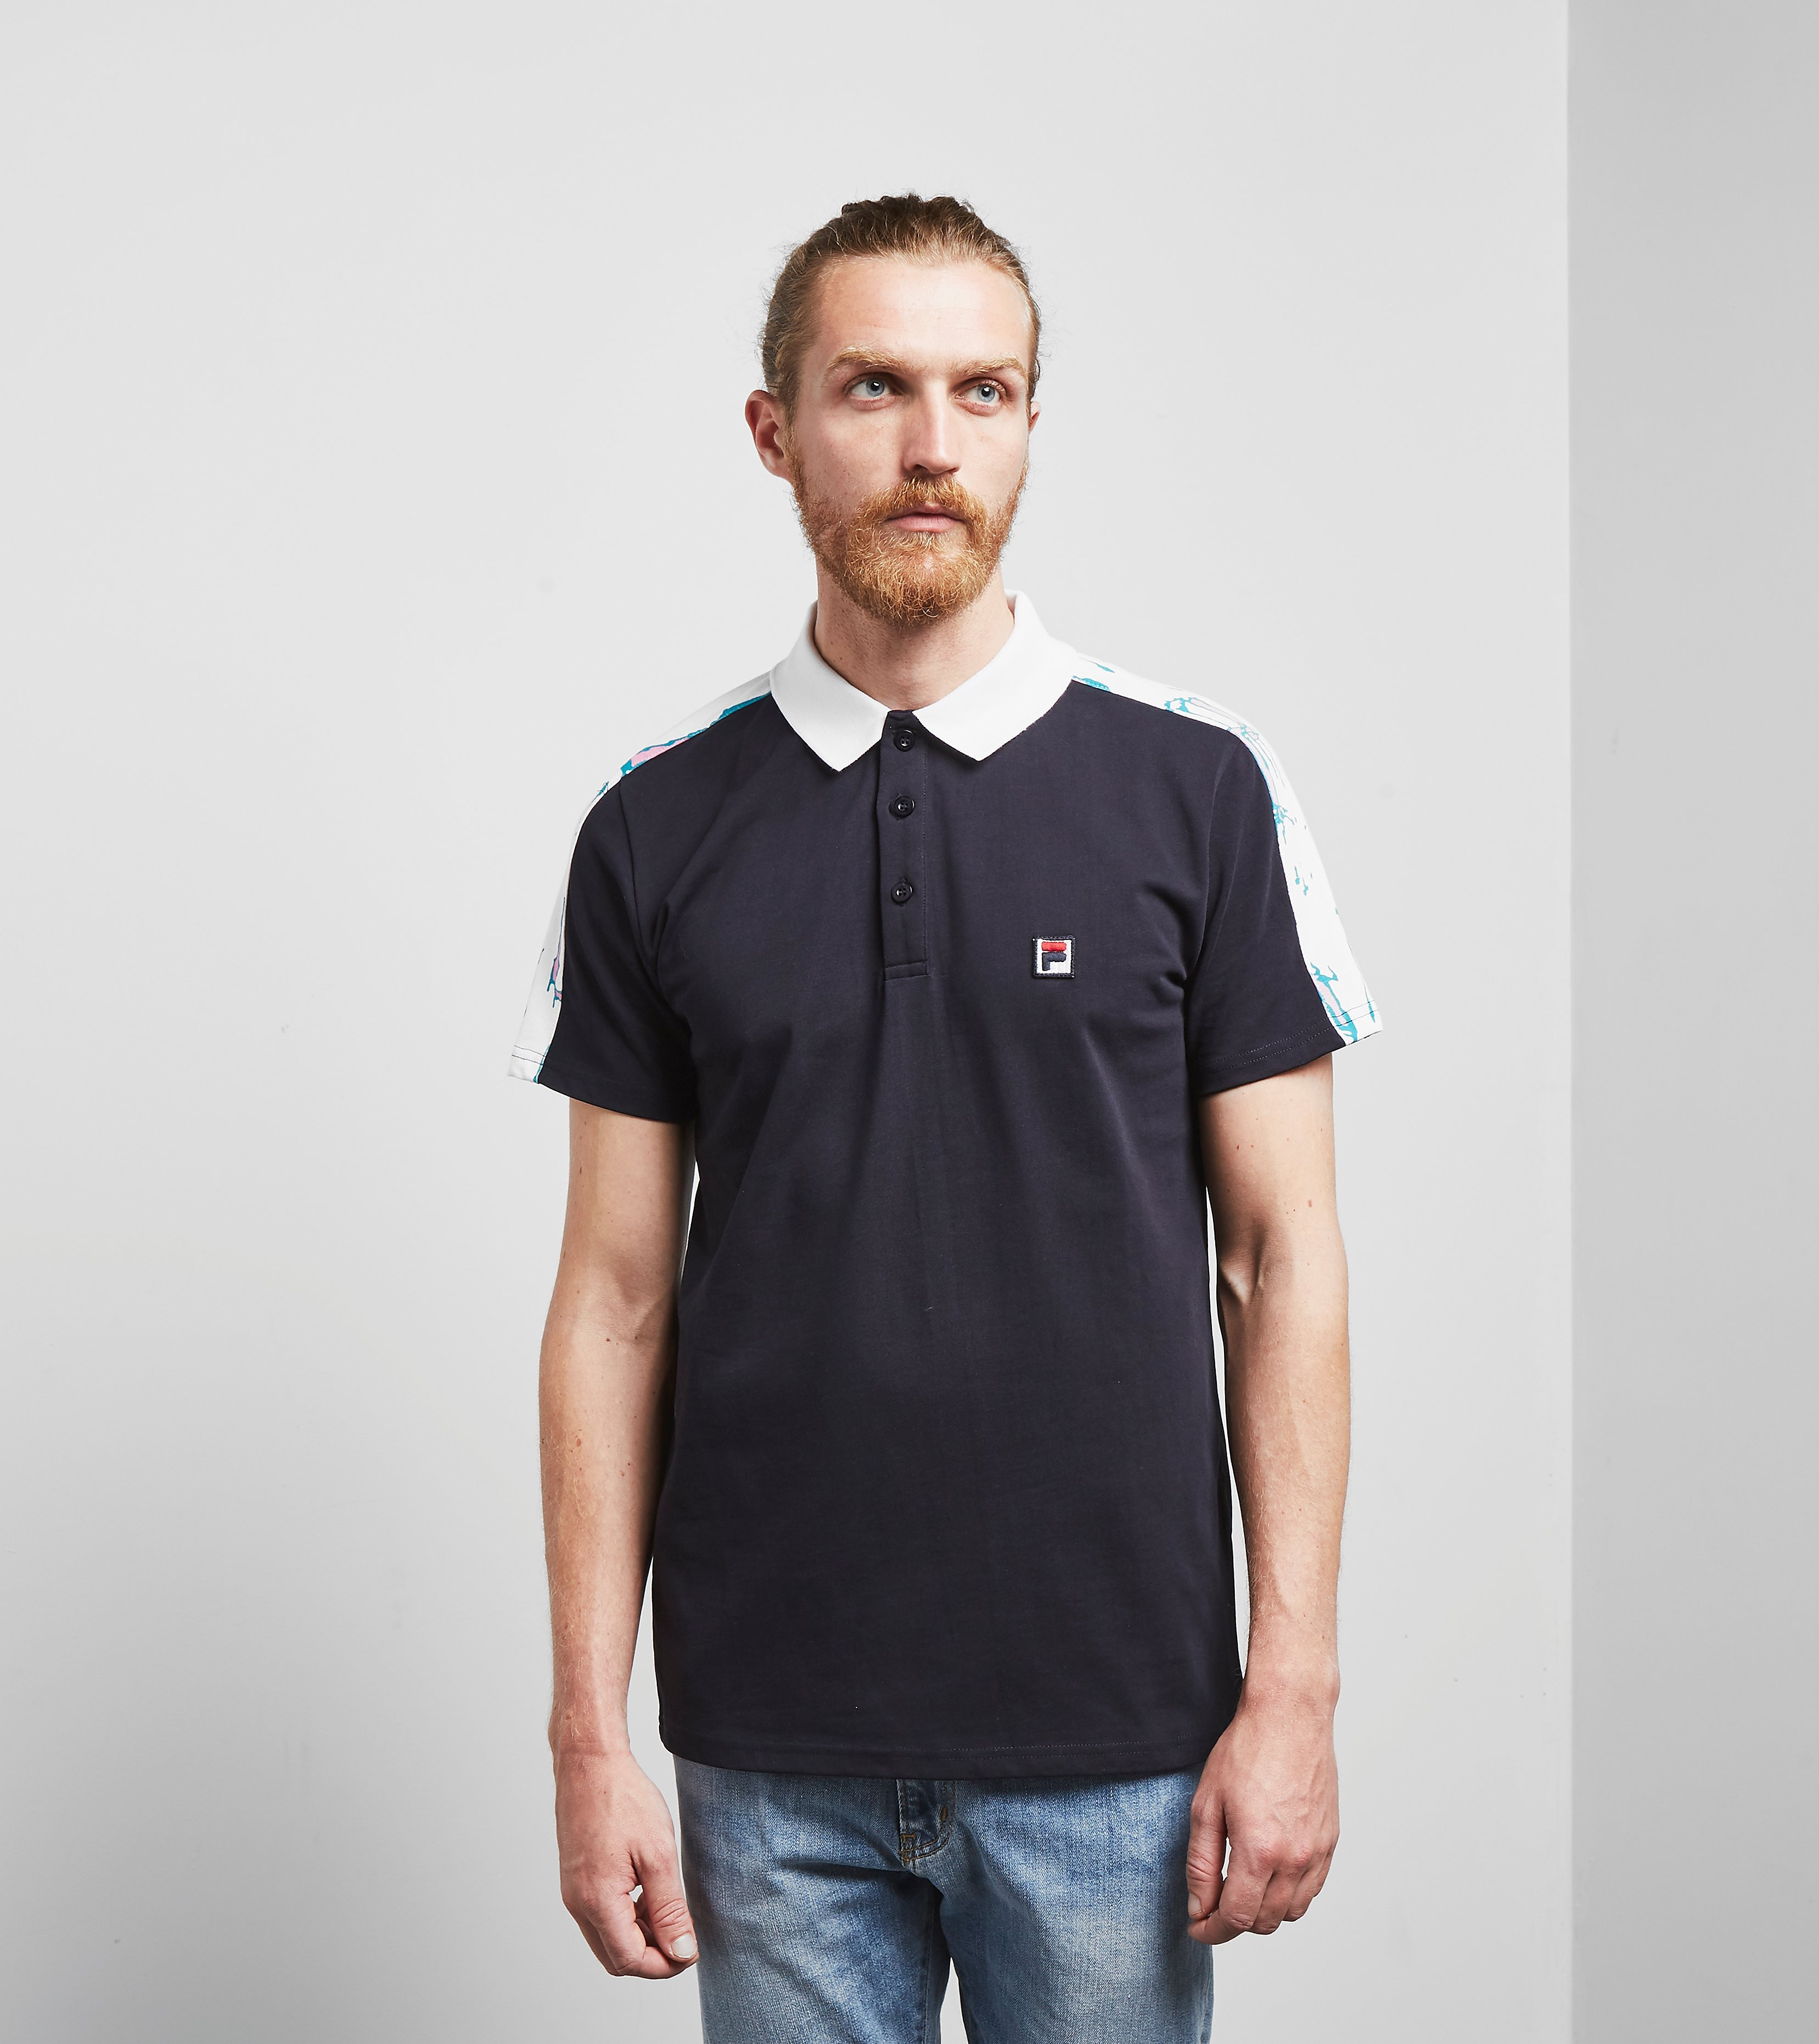 Fila Riveroaks Polo Shirt - size? Exclusive